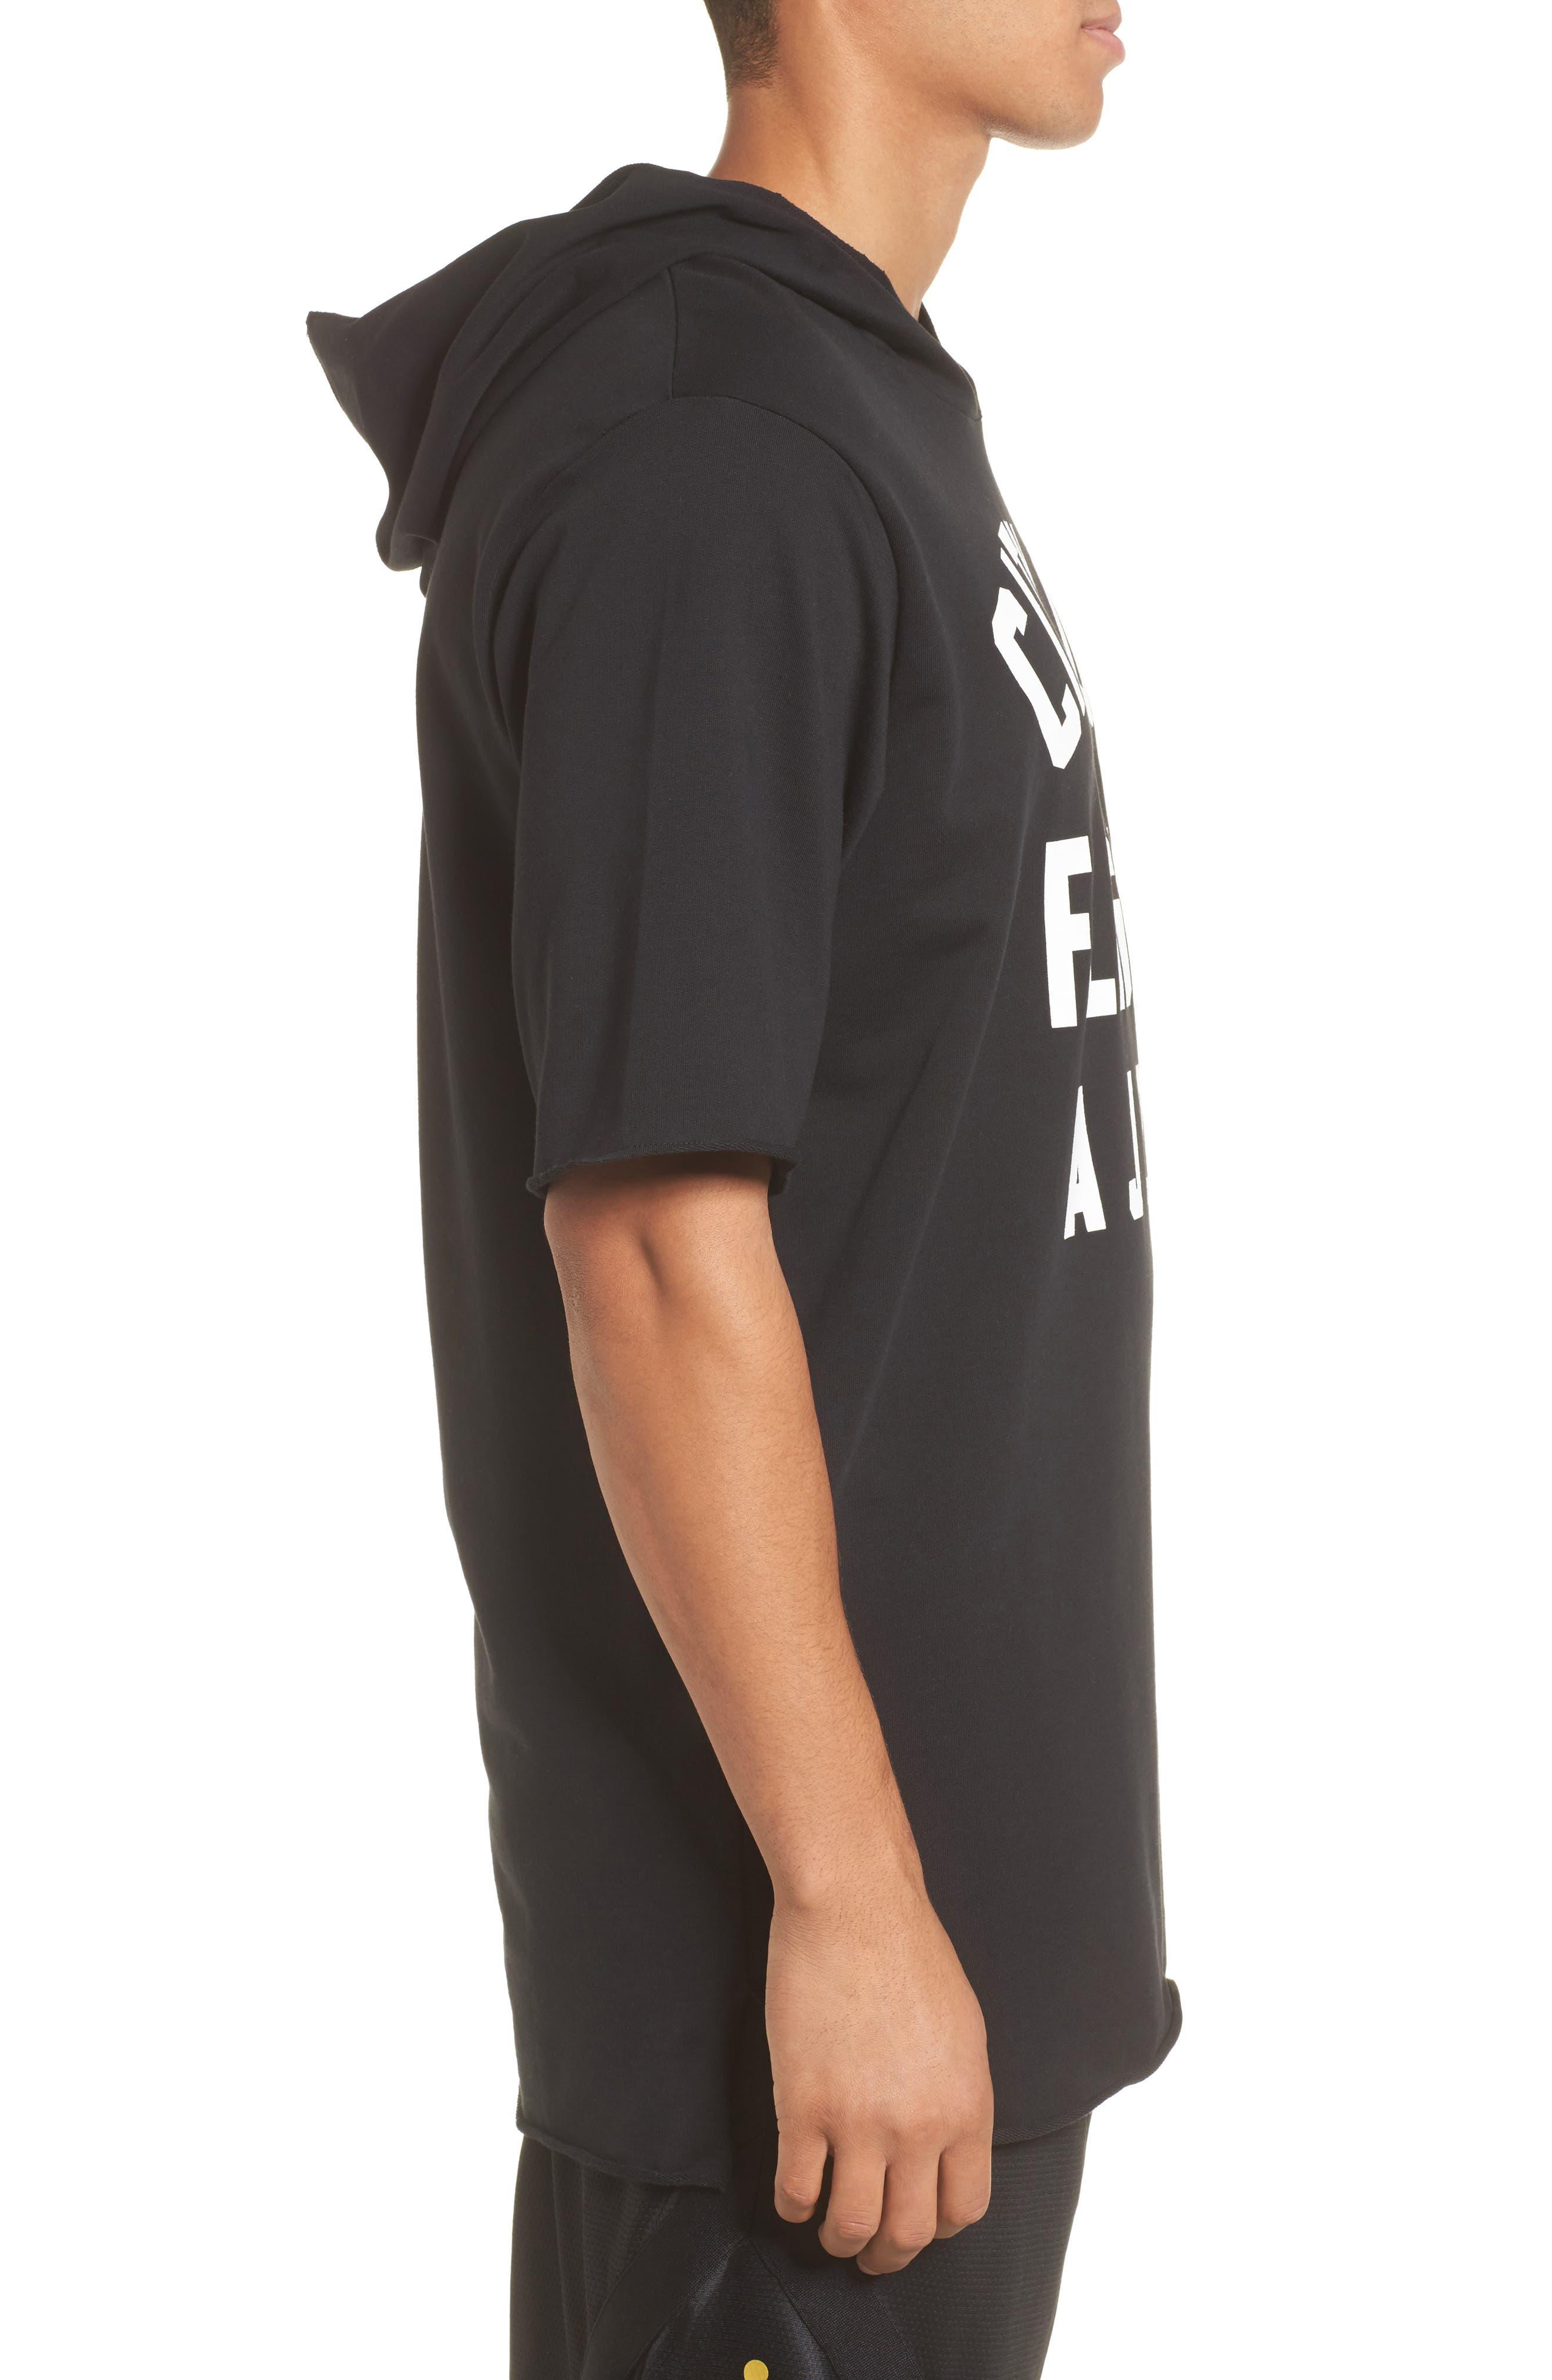 Sportswear City of Flight Hooded T-Shirt,                             Alternate thumbnail 3, color,                             Black/ White